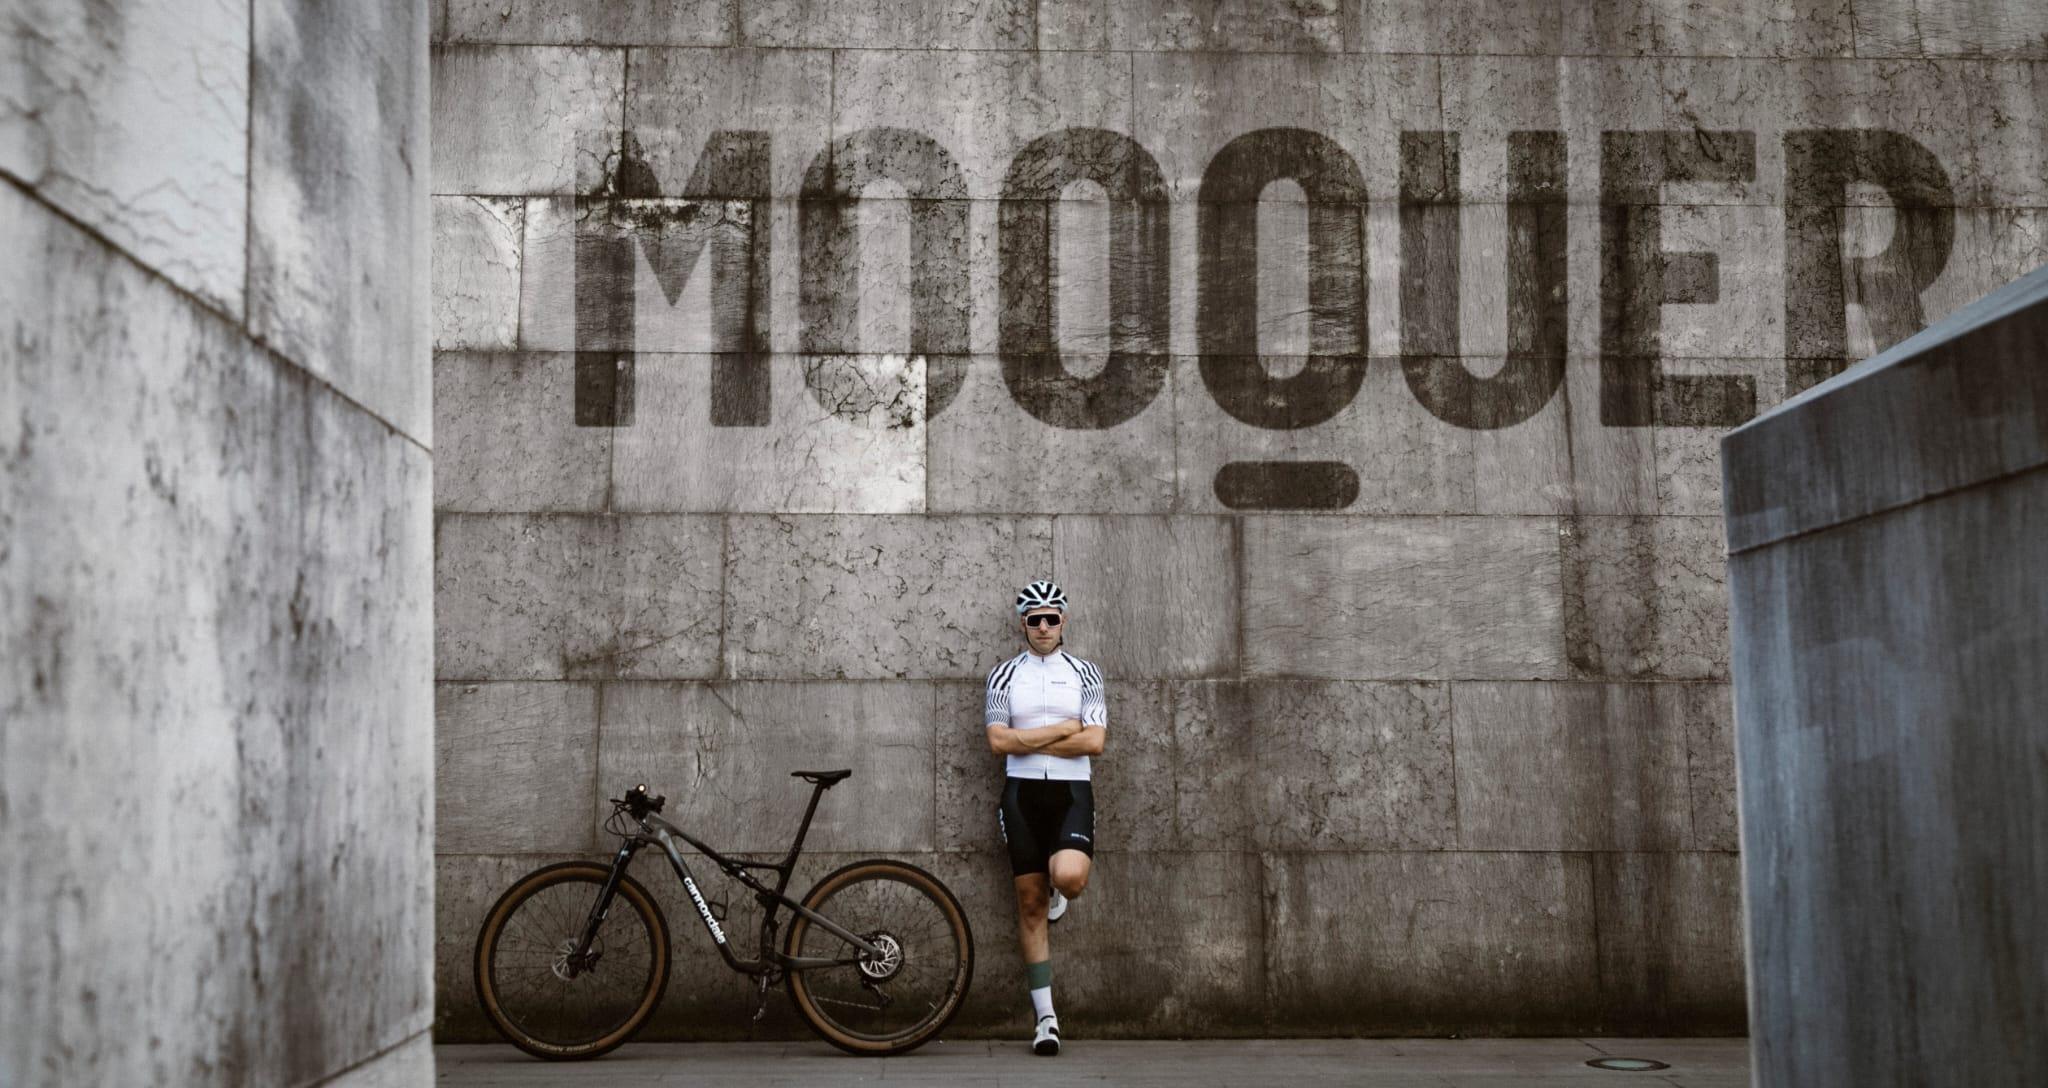 Mooquer ropa de ciclismo ropa ciclista calcetines de ciclismo